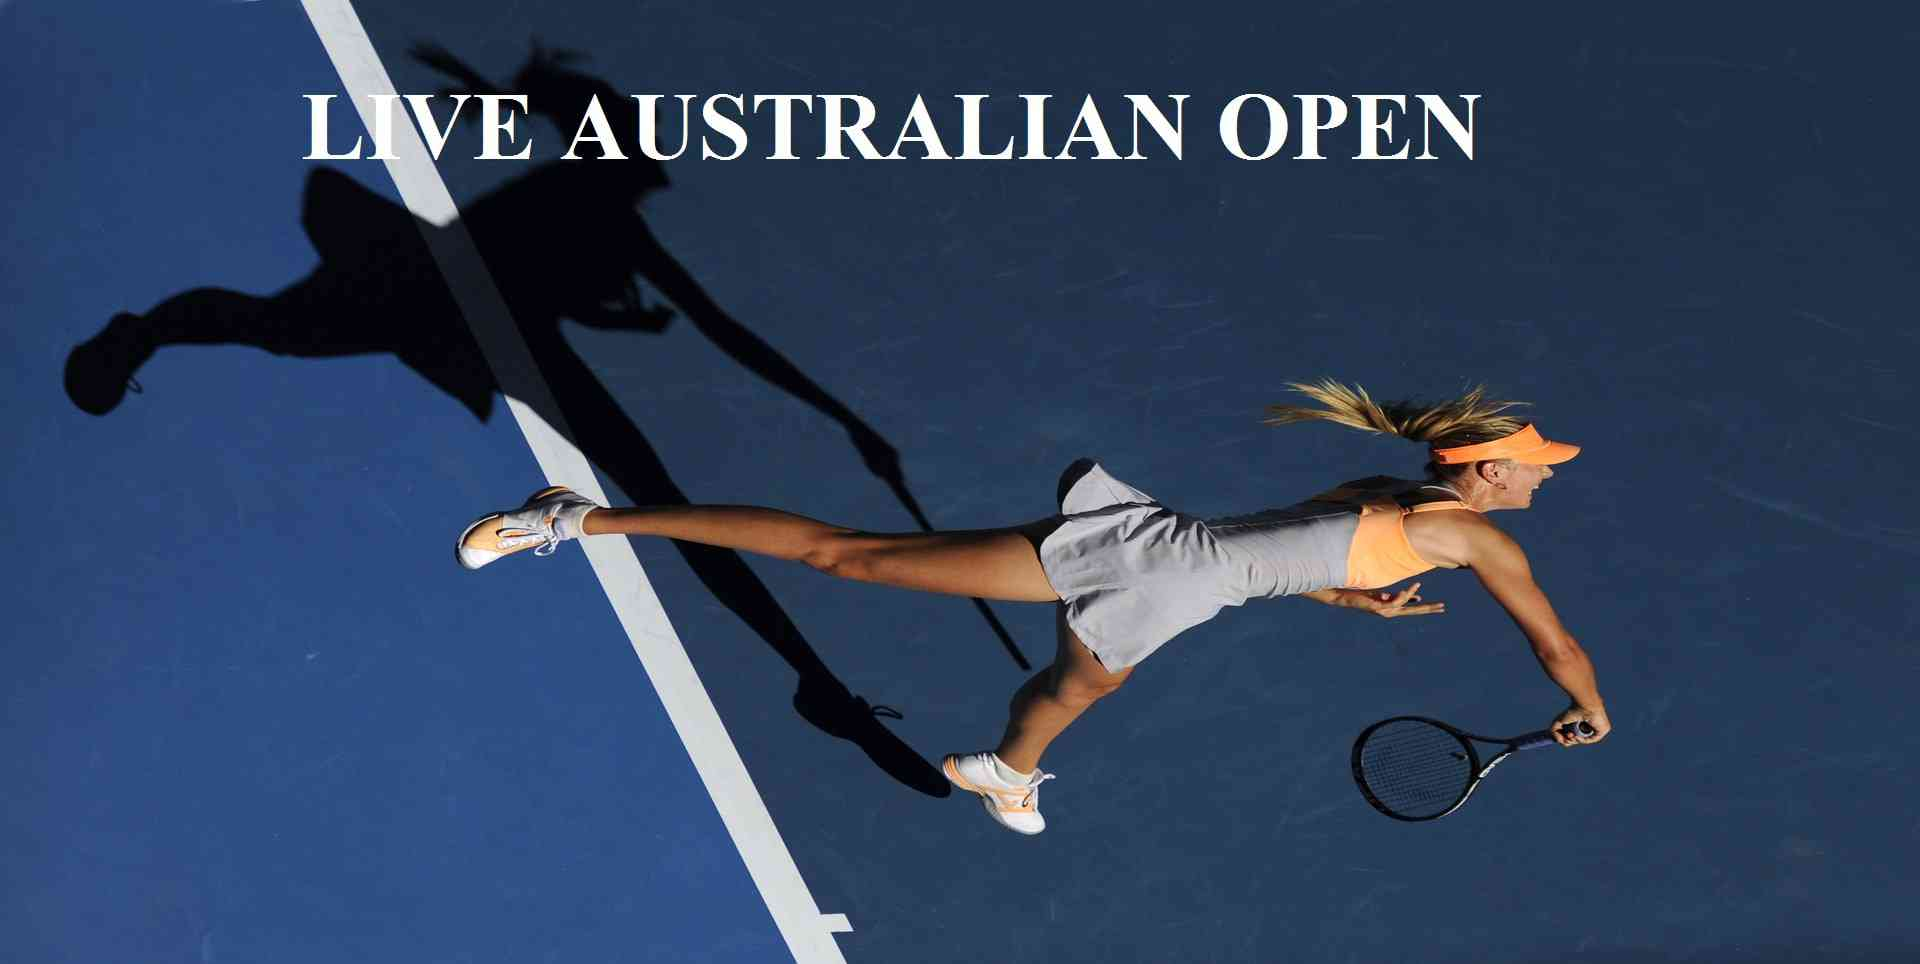 Rafael Nadal vs Estrella Burgos Rd 1 Australian Open Live